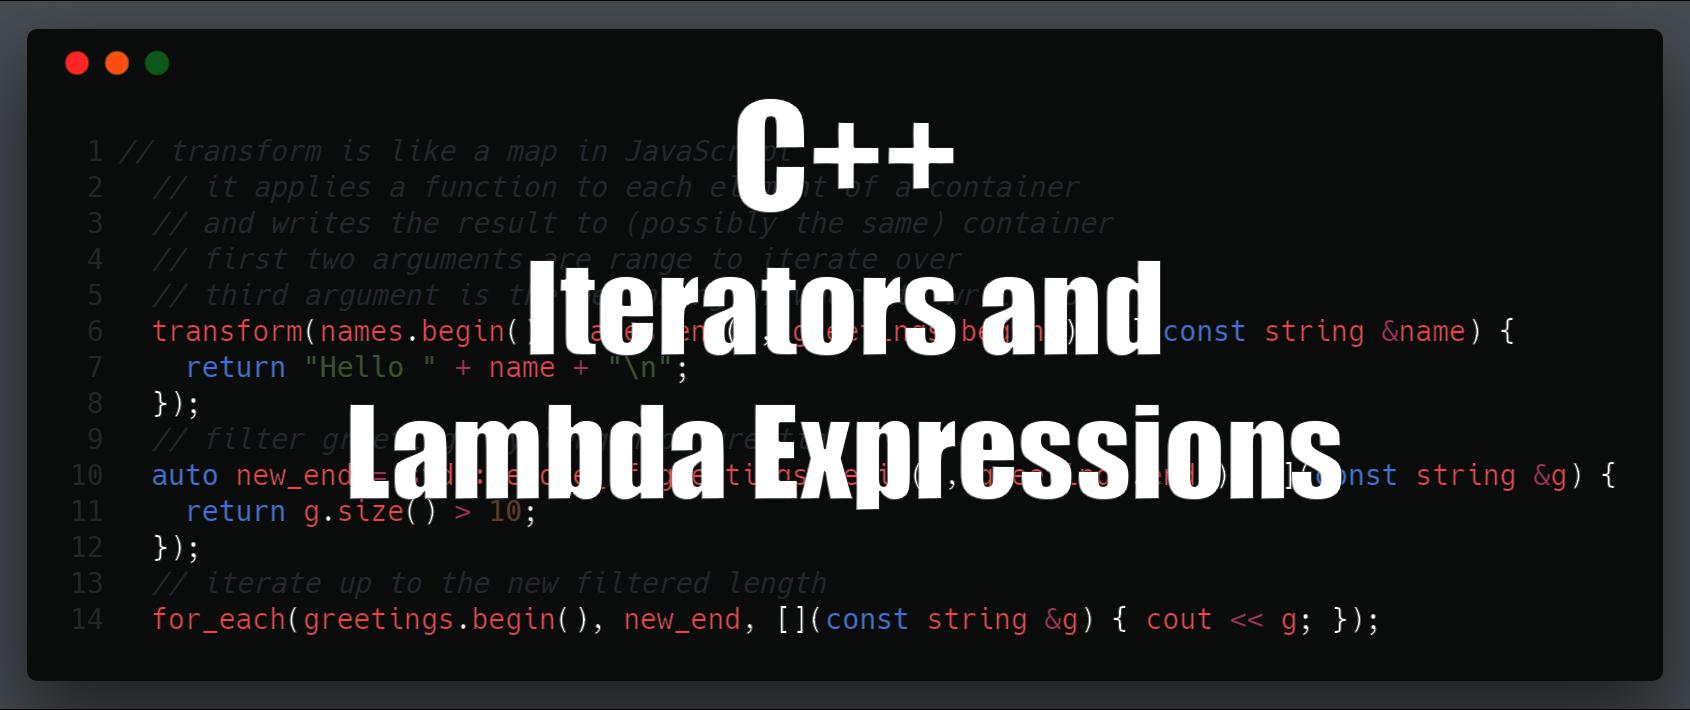 C++ Guide for EOS Development - Iterators & Lambda Expressions | cmichel